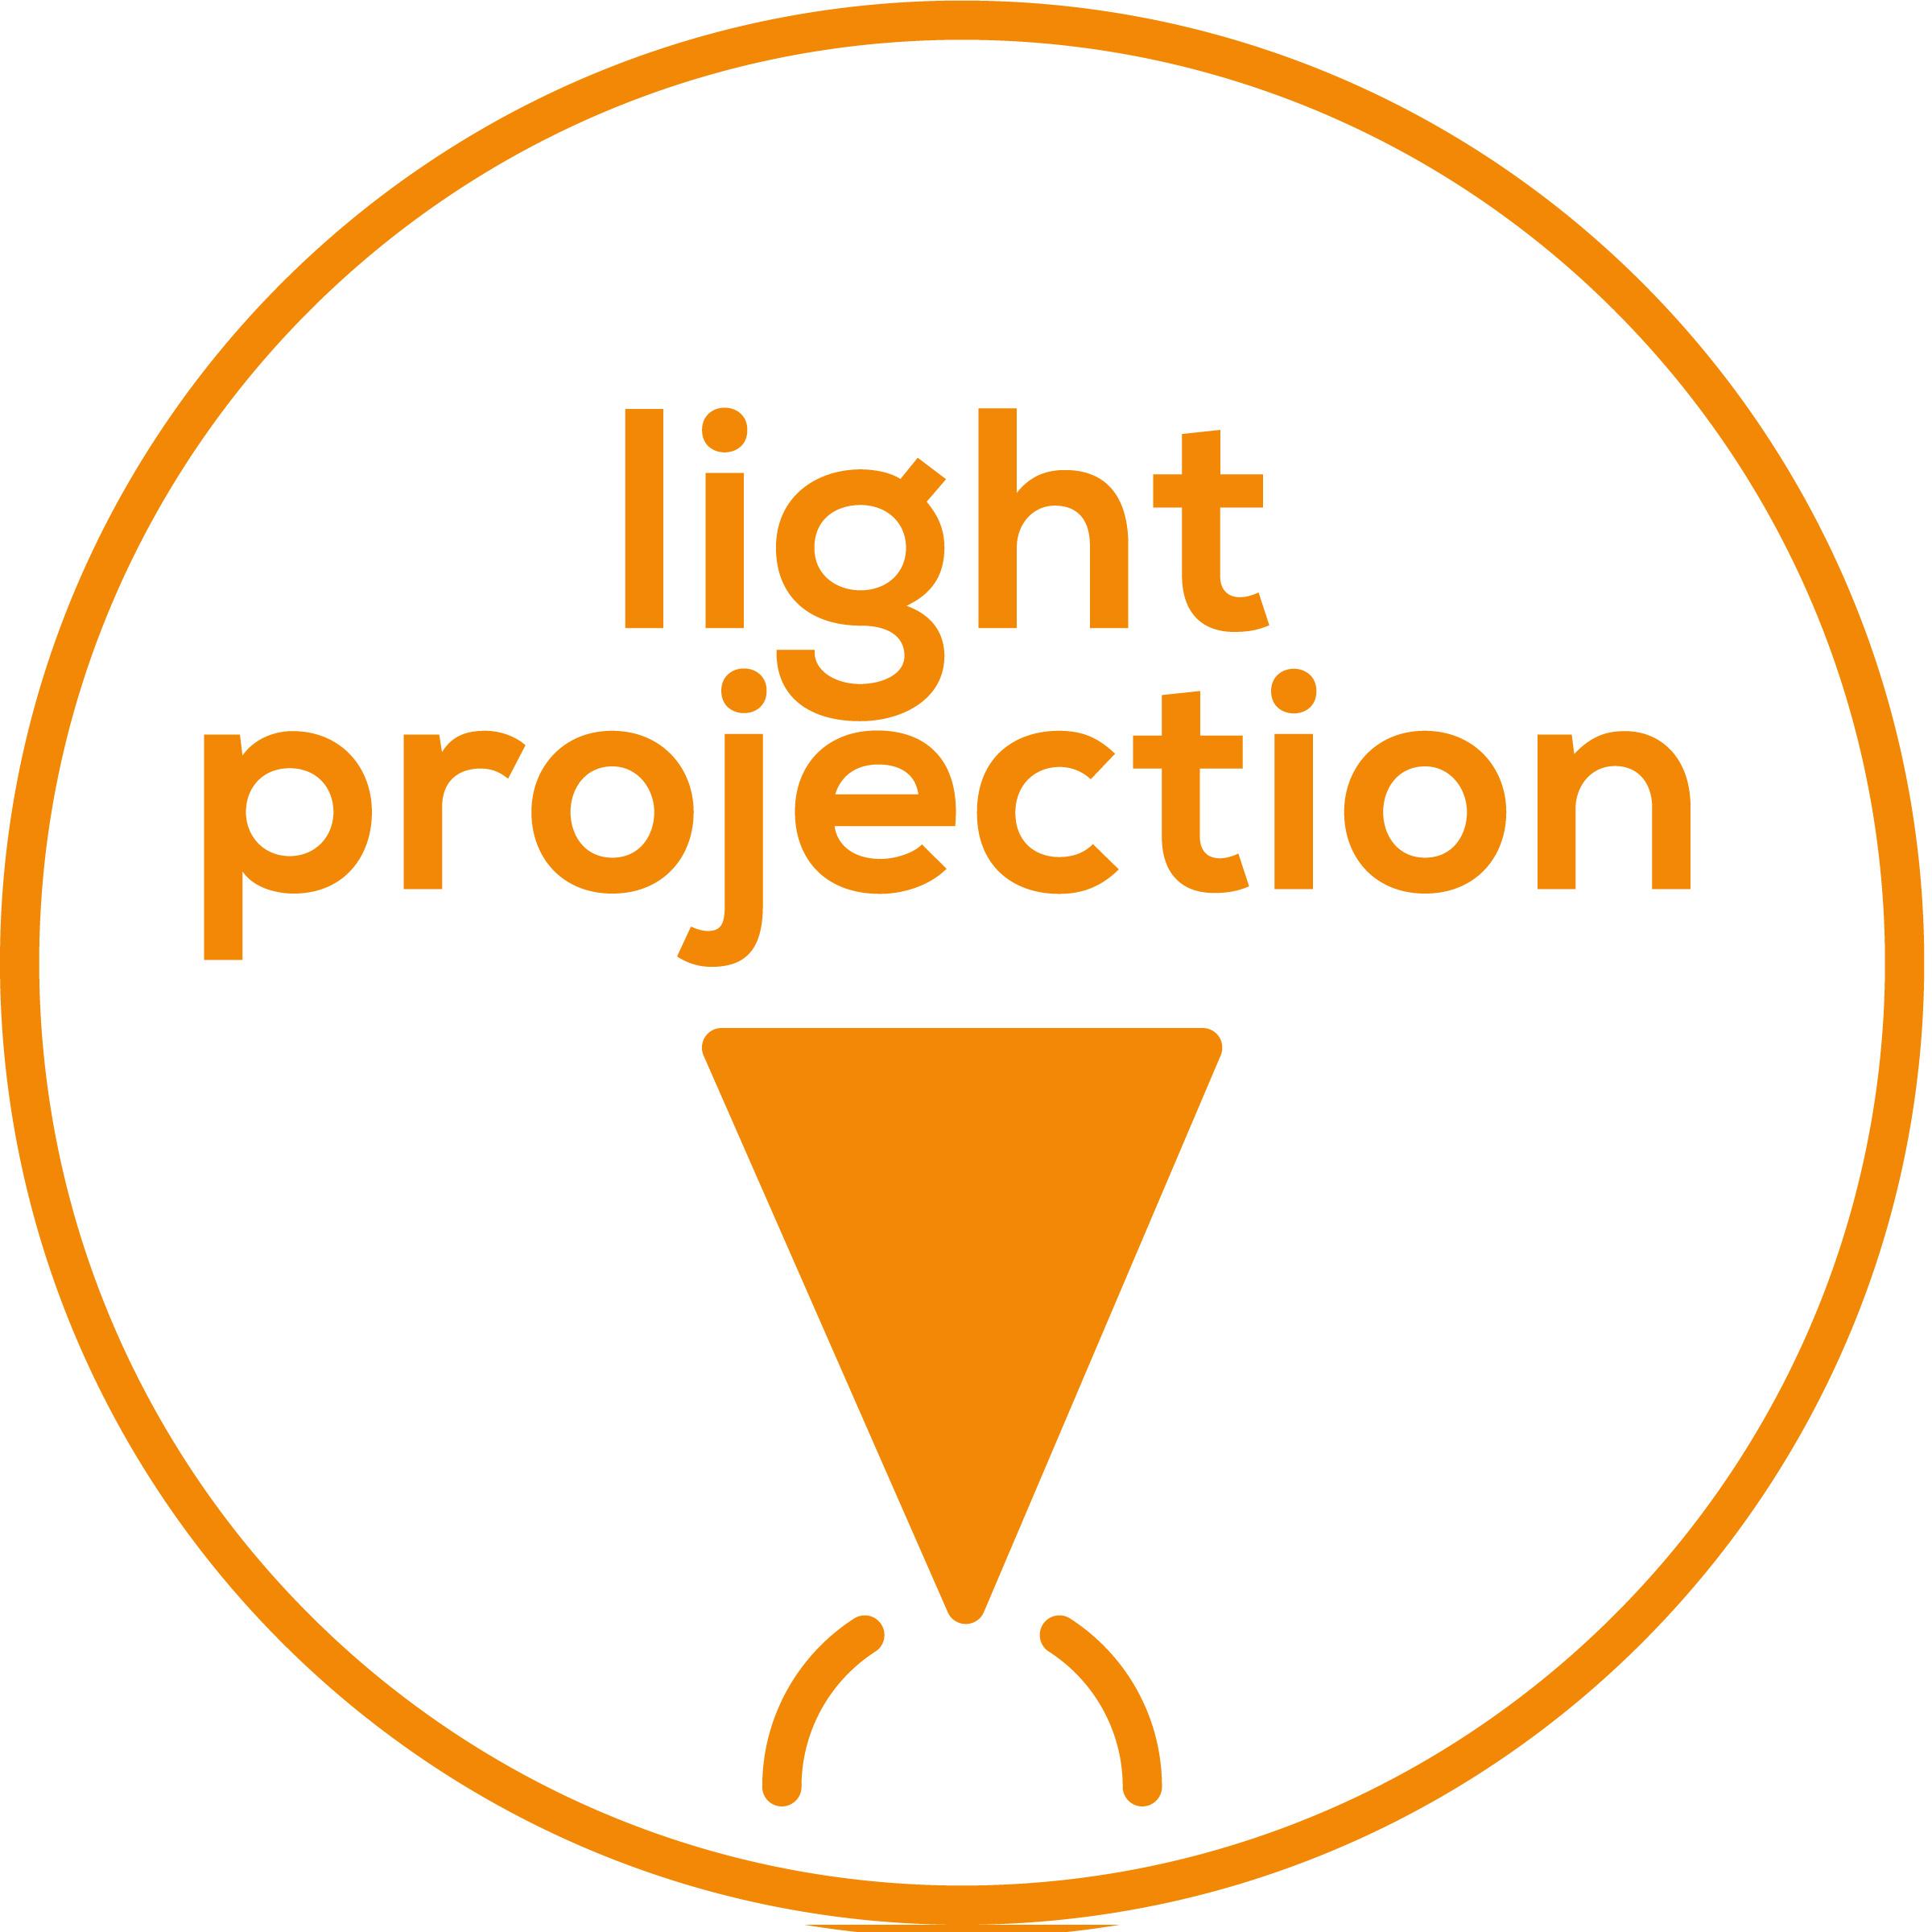 Projection de lumière Projection de lumière pulsée au plafond